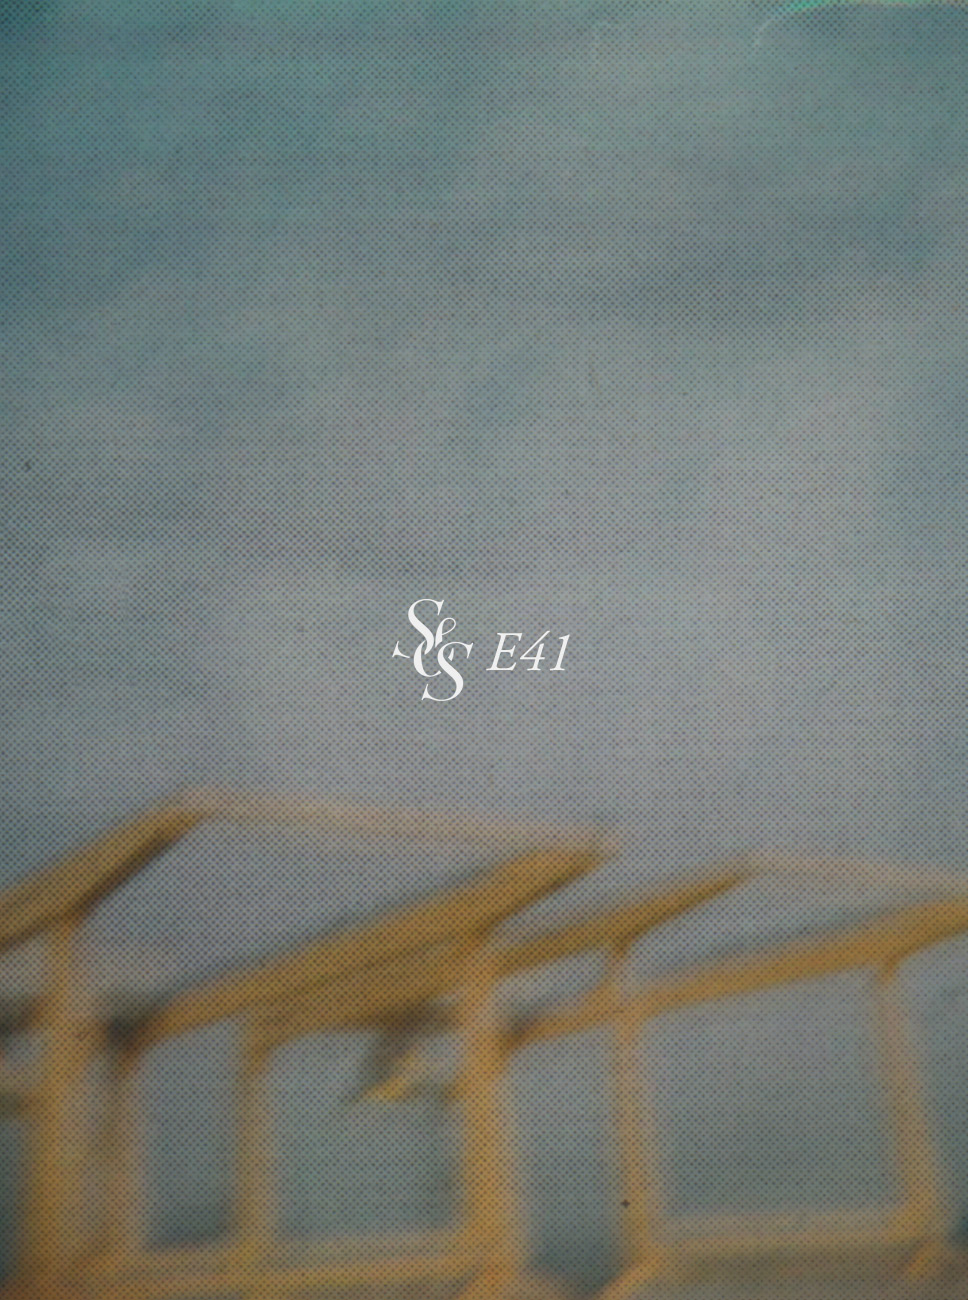 ss-newtownradio-e41